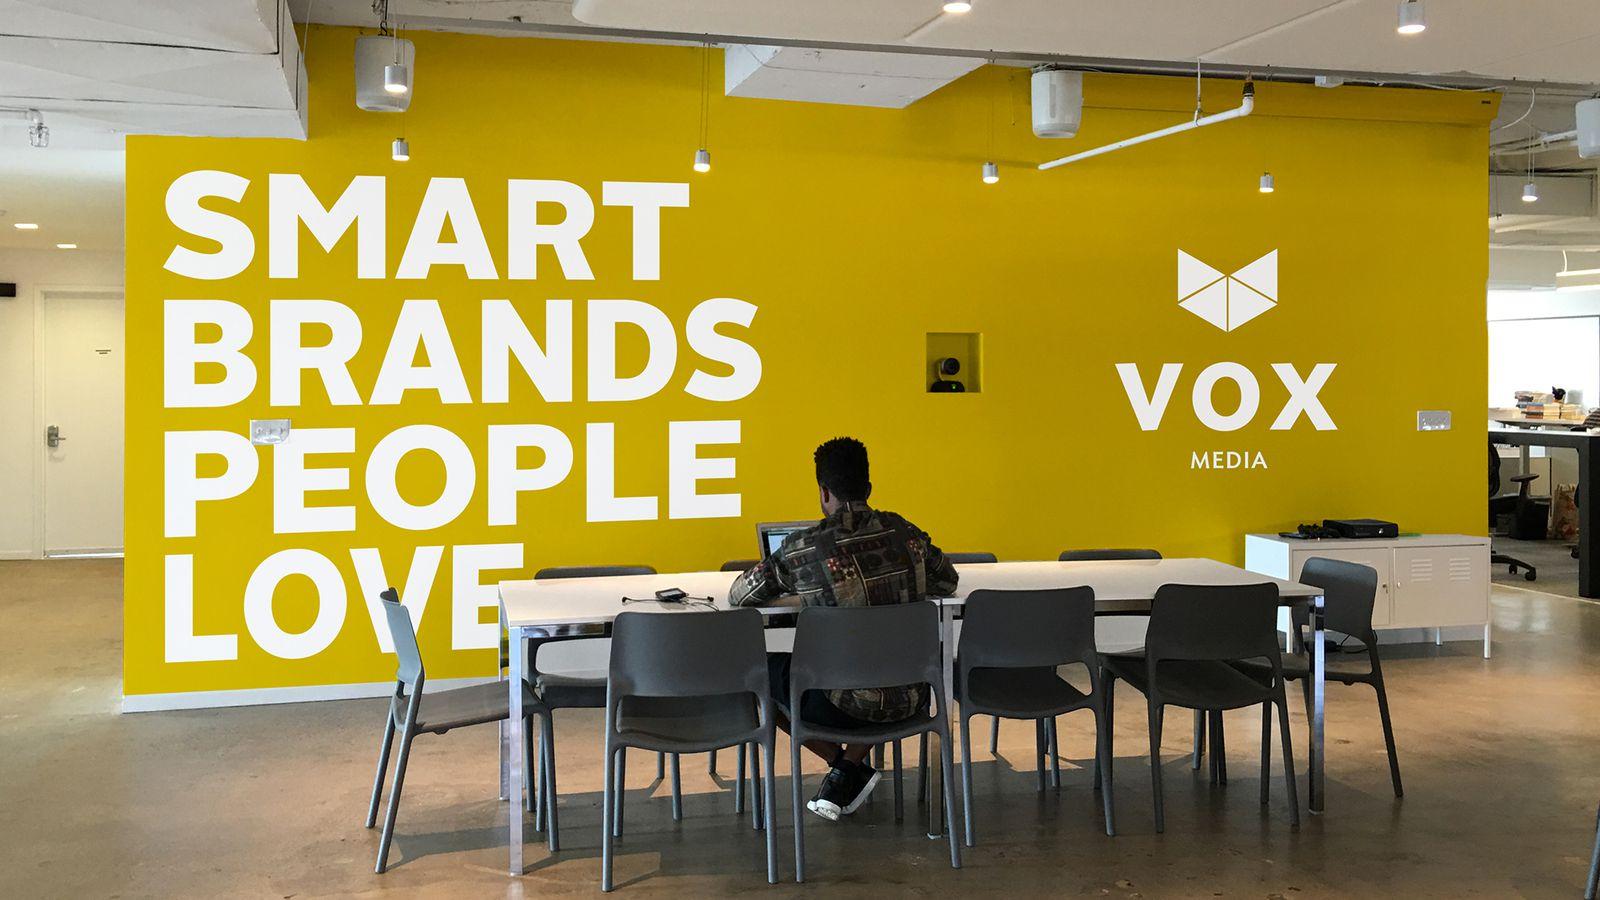 Careers at Vox Media